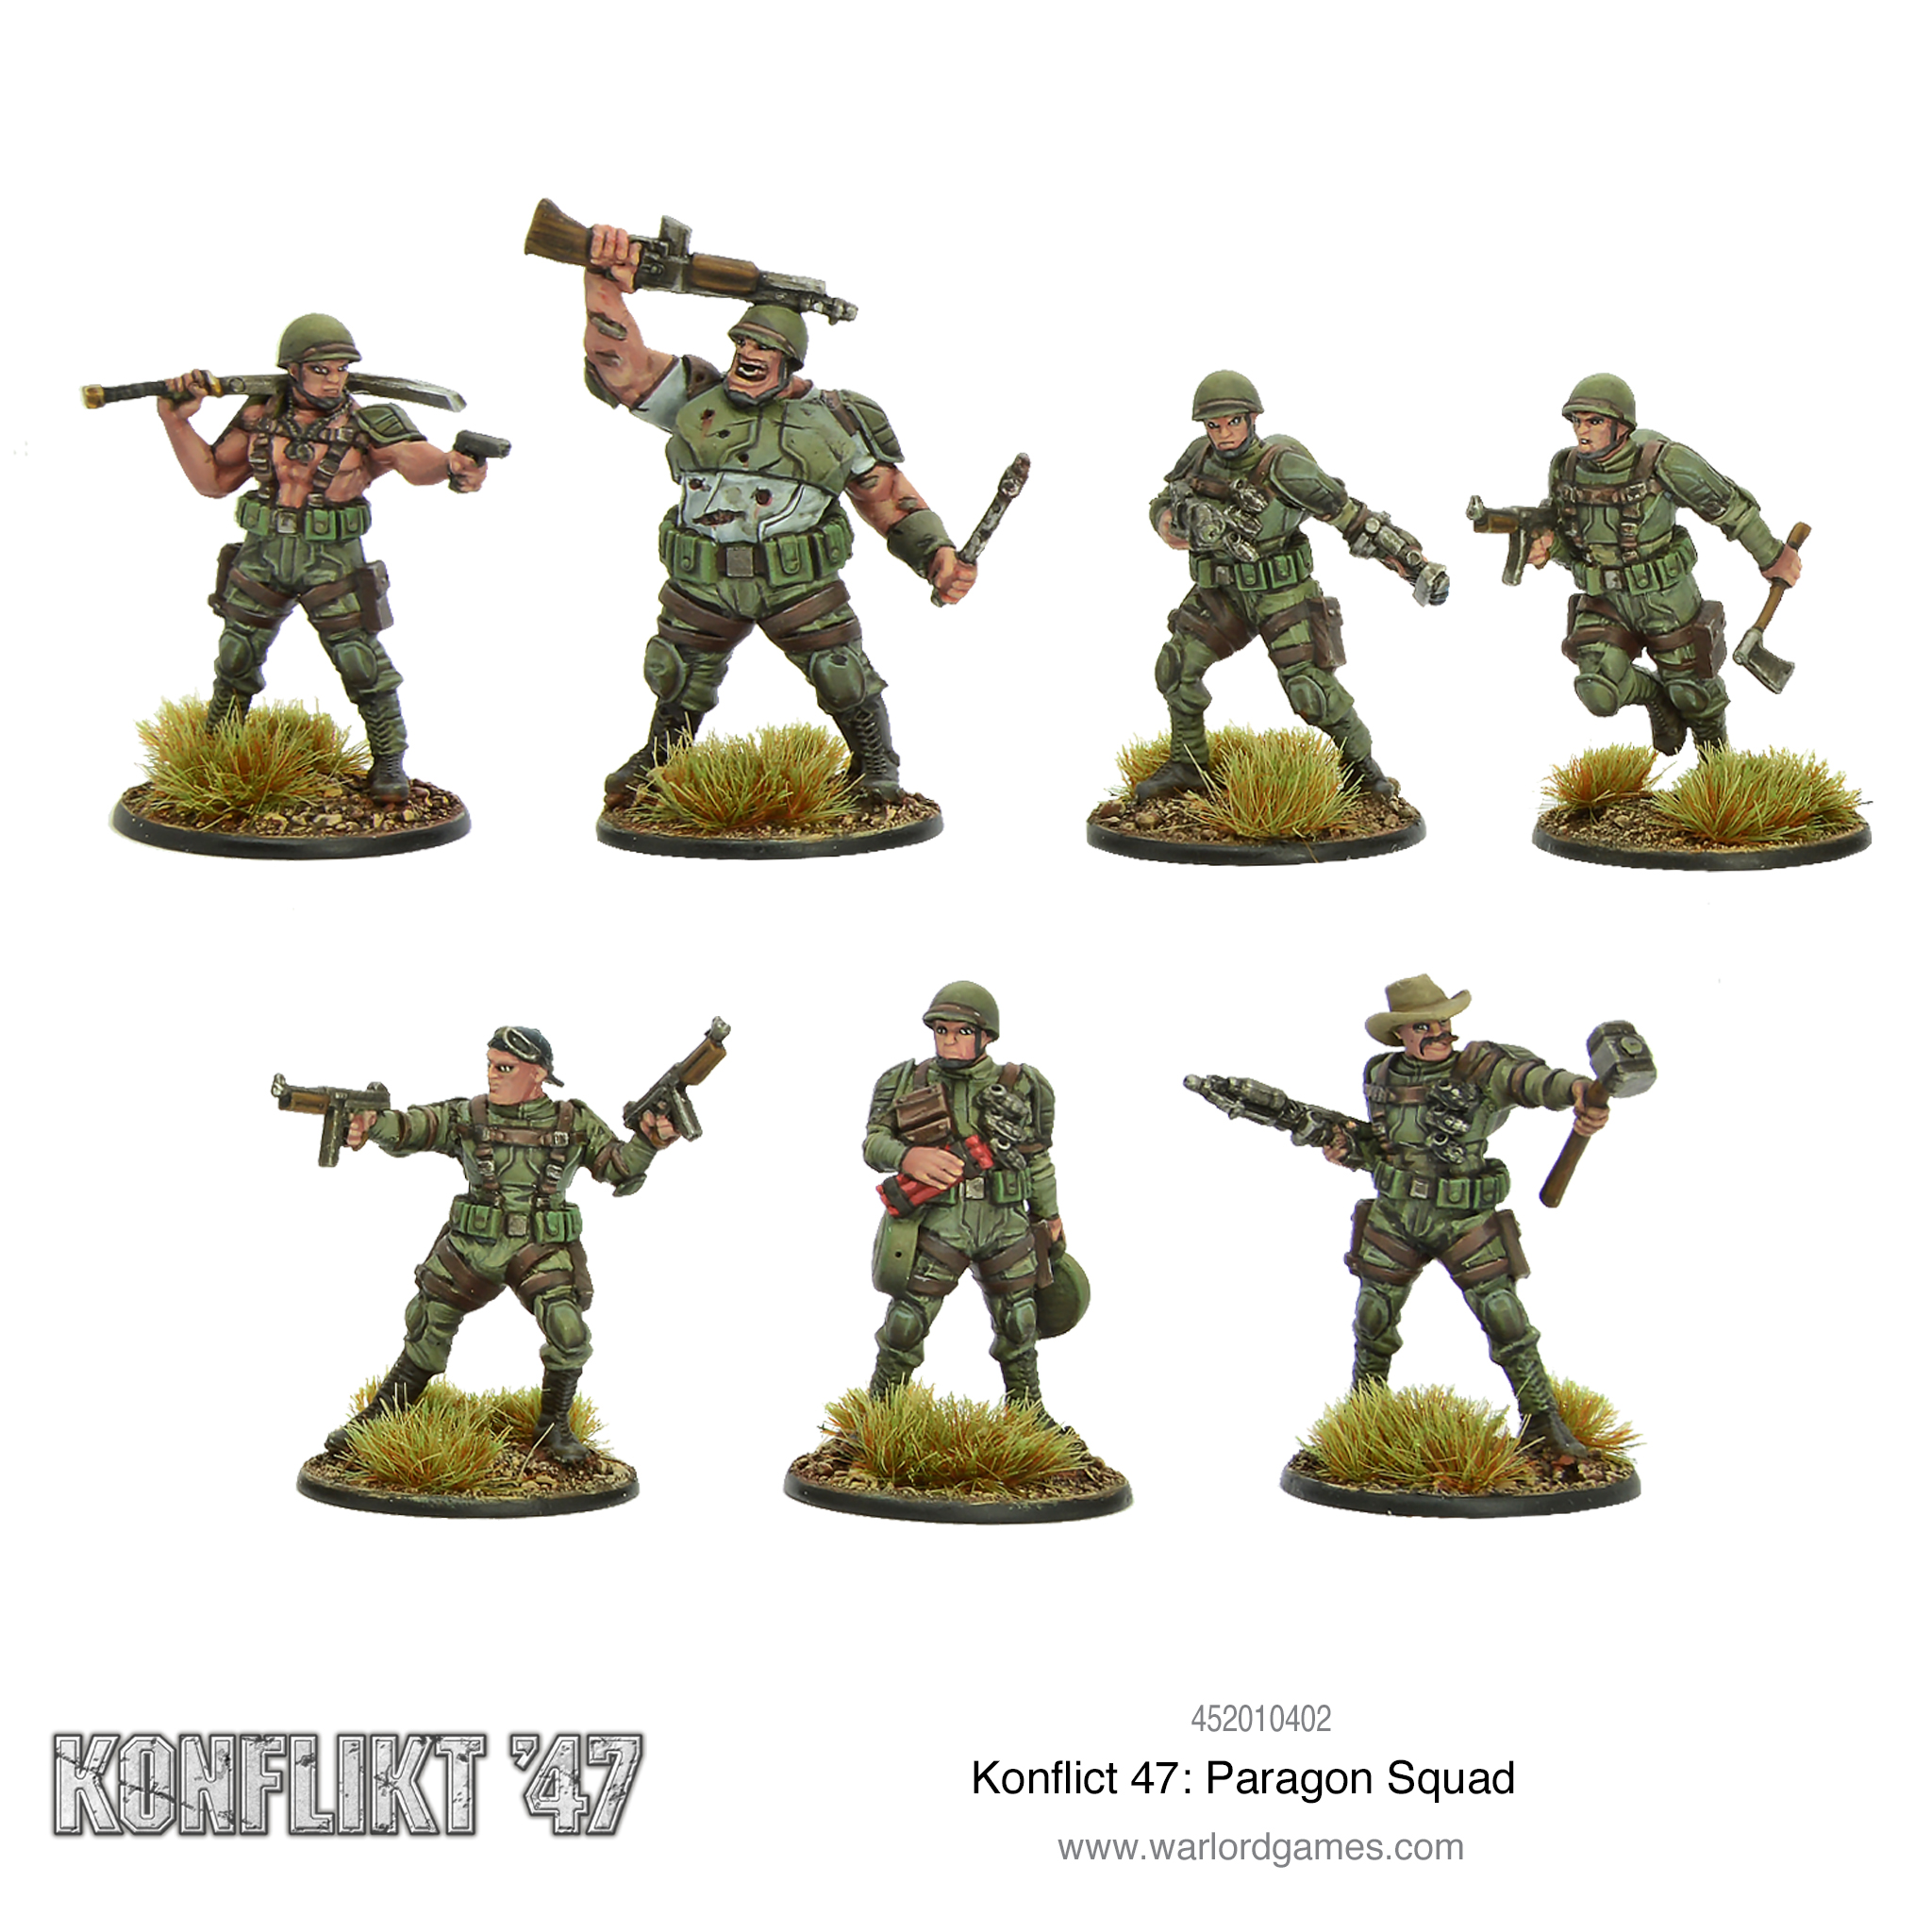 K'47 US Paragon Squad